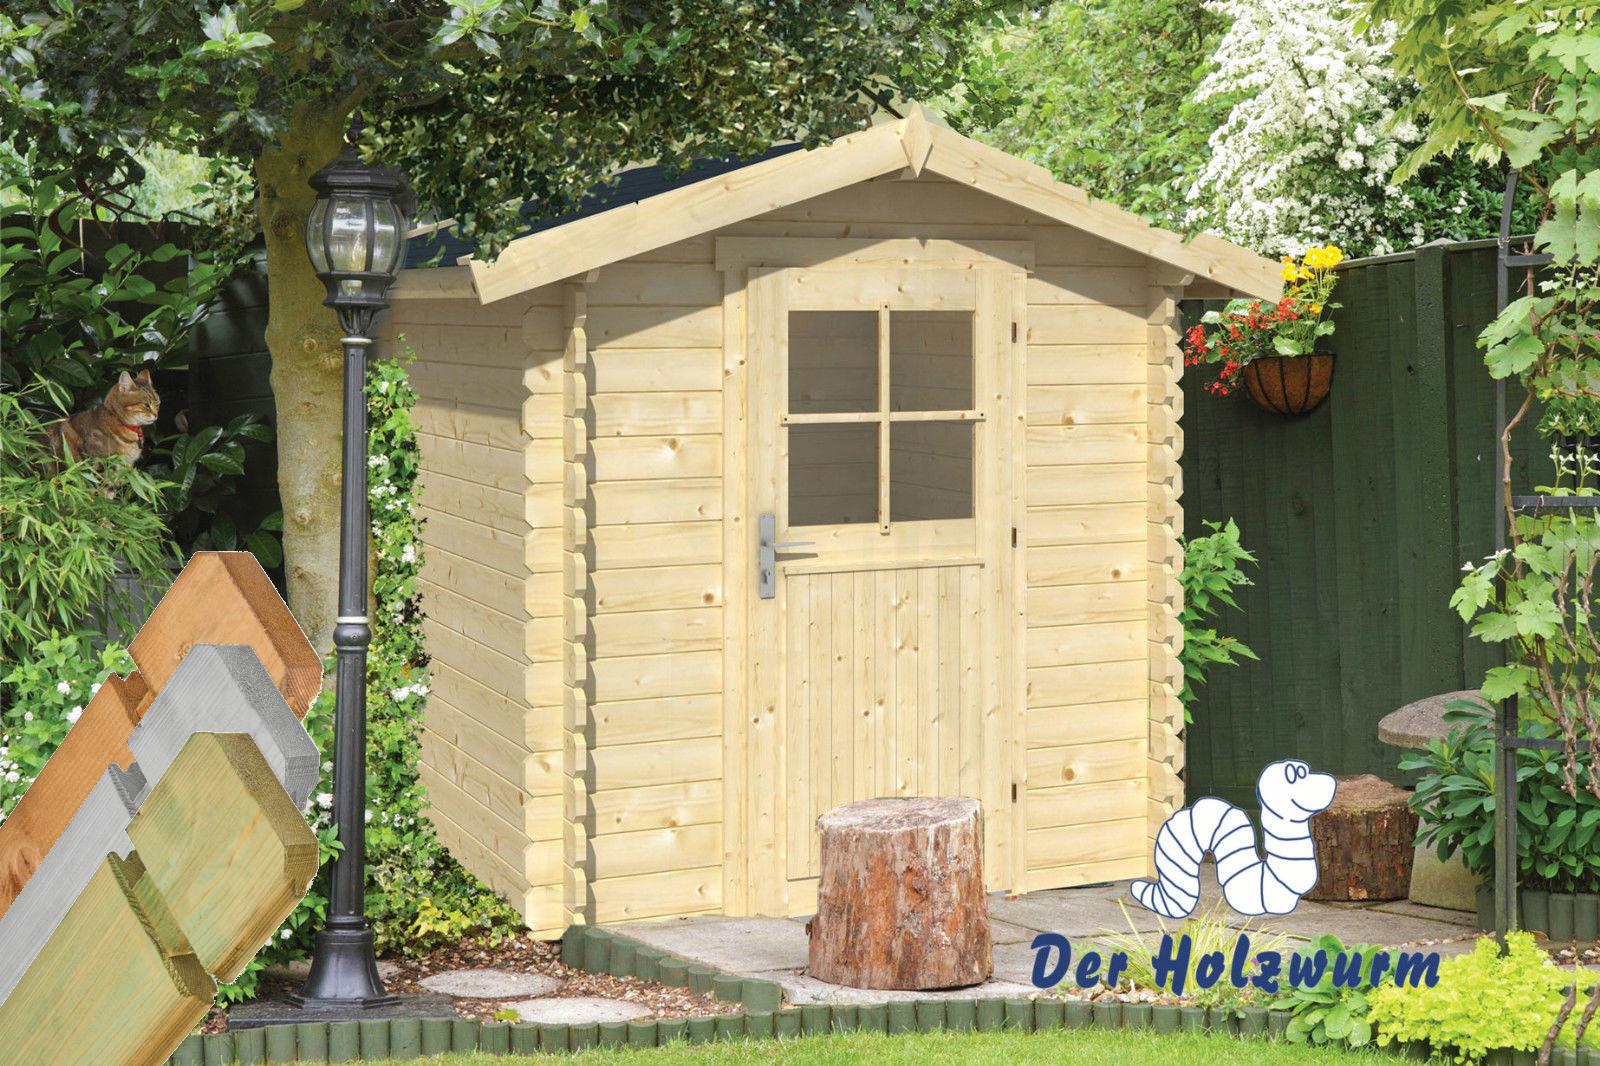 gartenhaus richard 28 mm ca 200x200 cm holzwurm. Black Bedroom Furniture Sets. Home Design Ideas